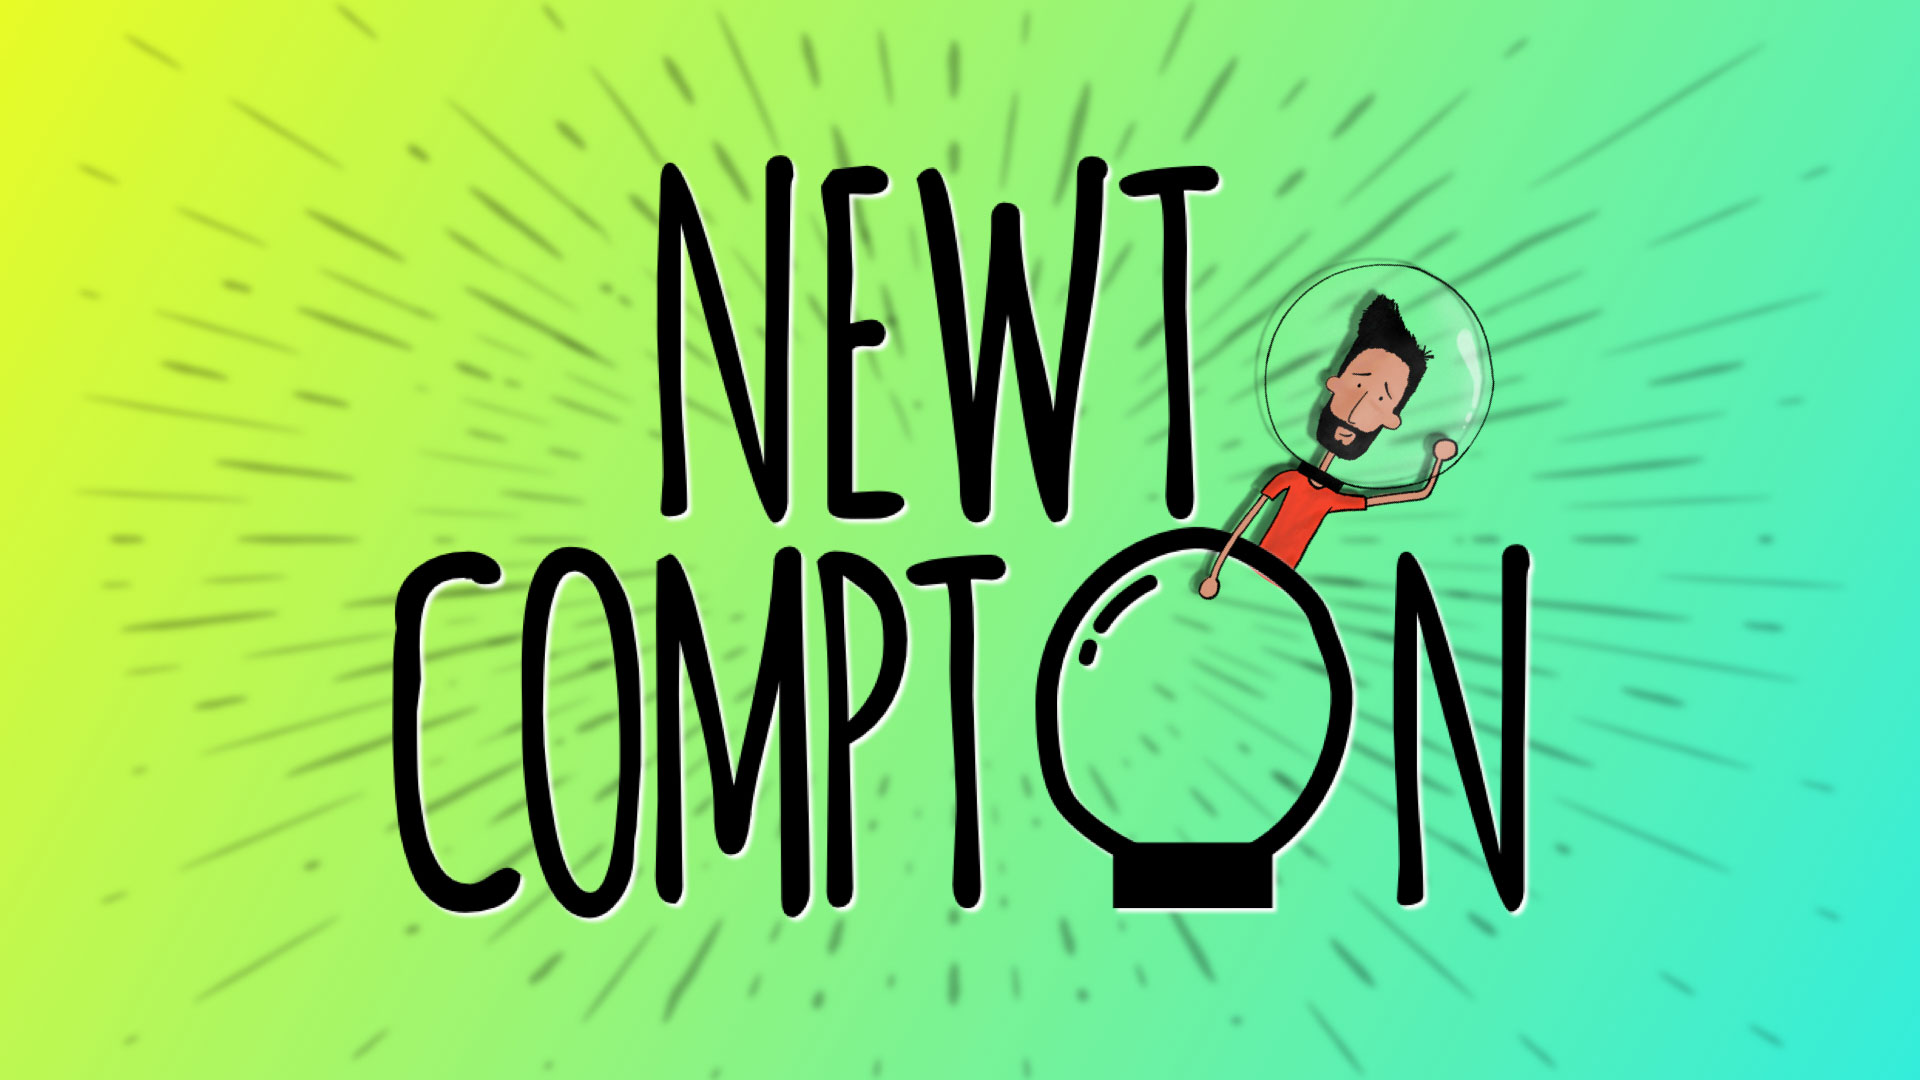 Newt.Compton - Season 1_opt